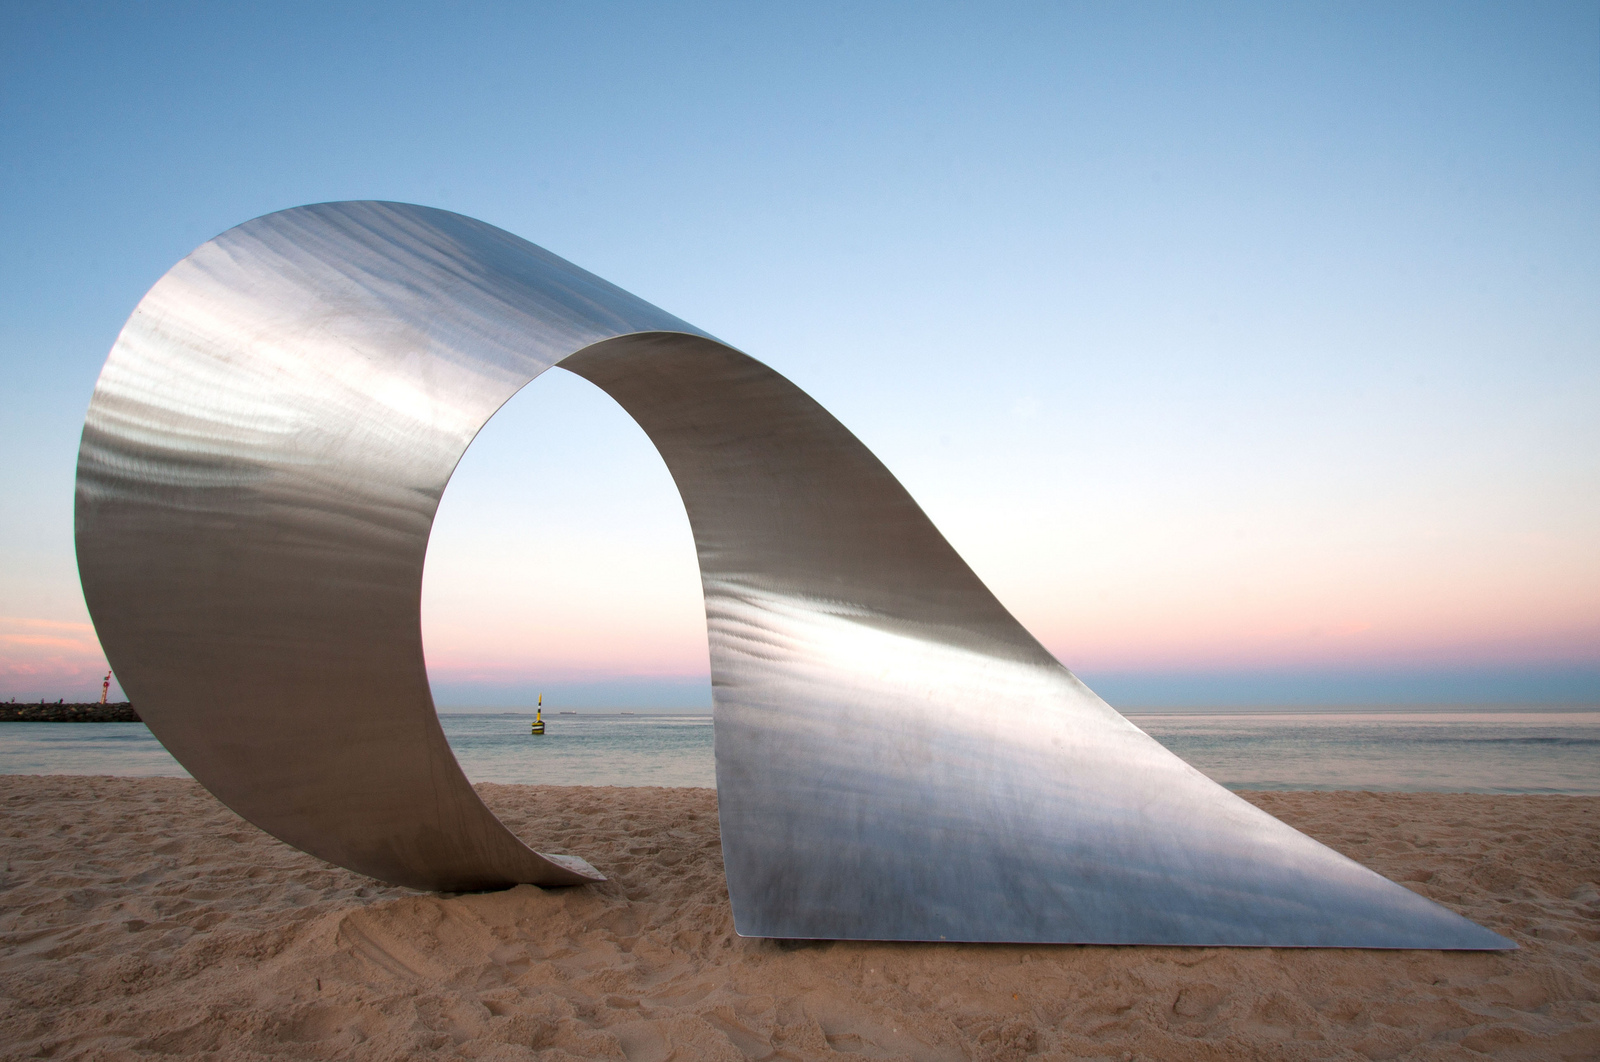 pannekoek_2012_convolution_sculpture_by_the_sea_04.jpg